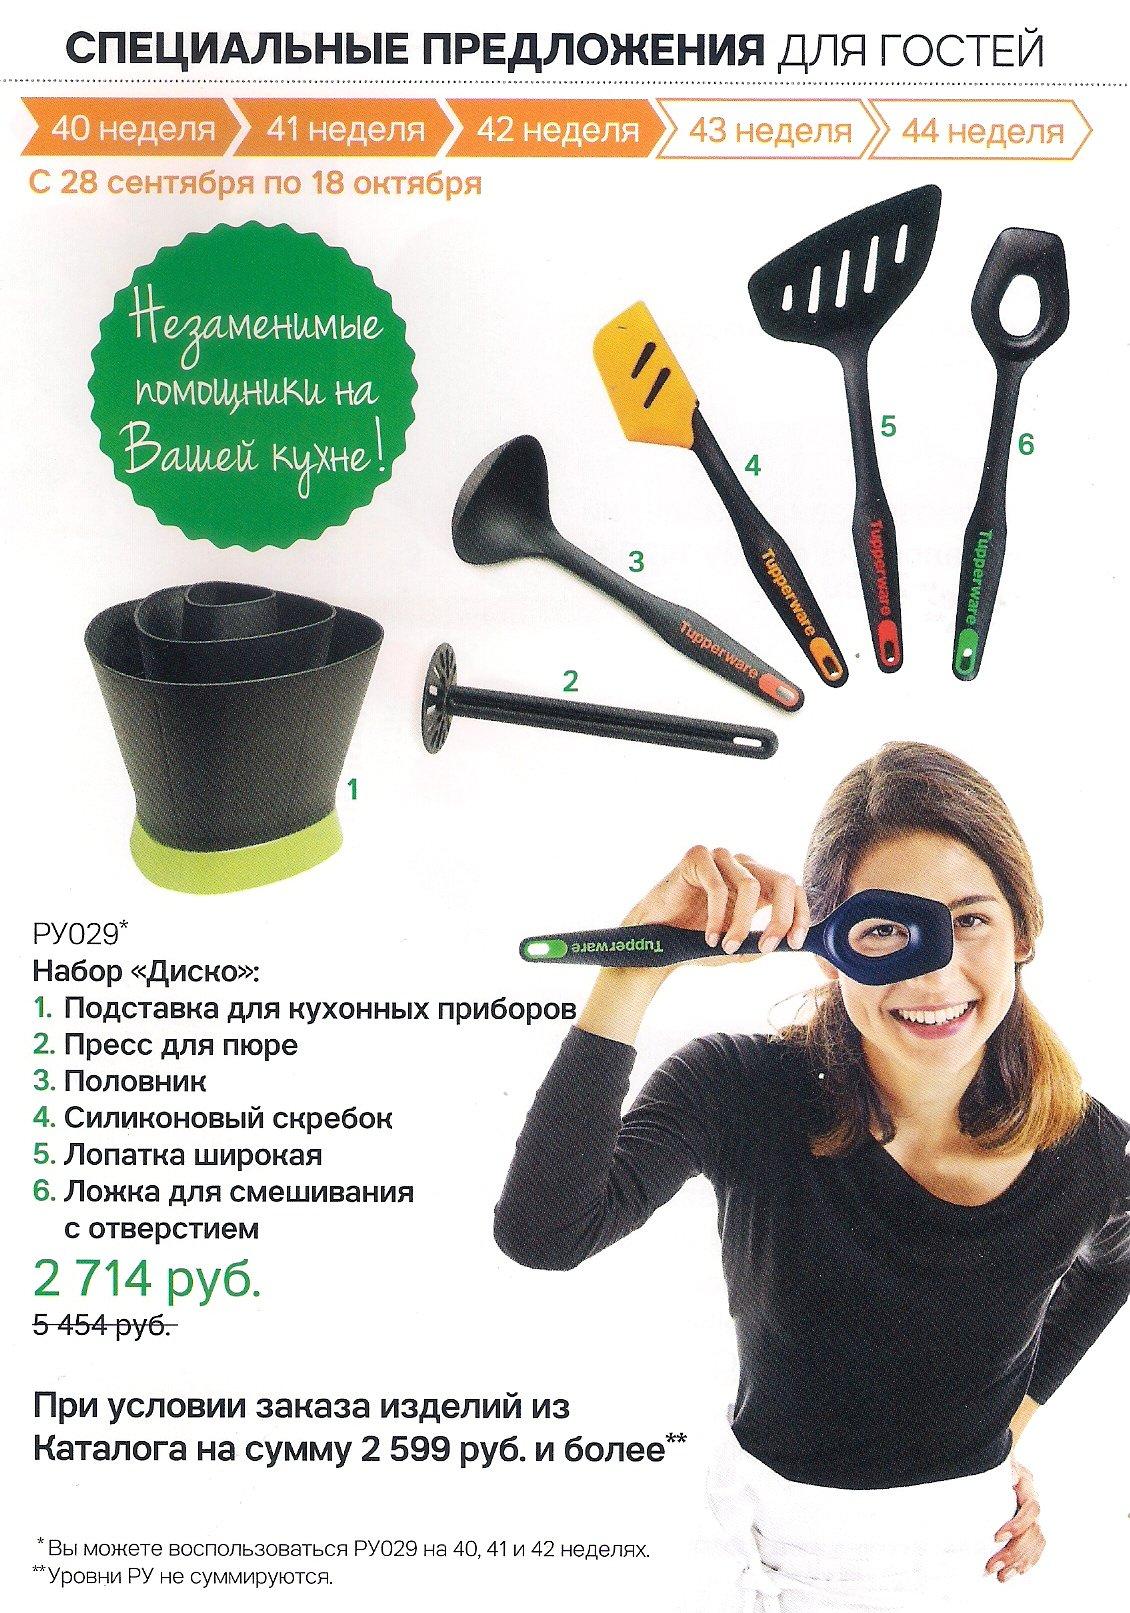 http://tupperware-online.ru/images/upload/4d.jpg